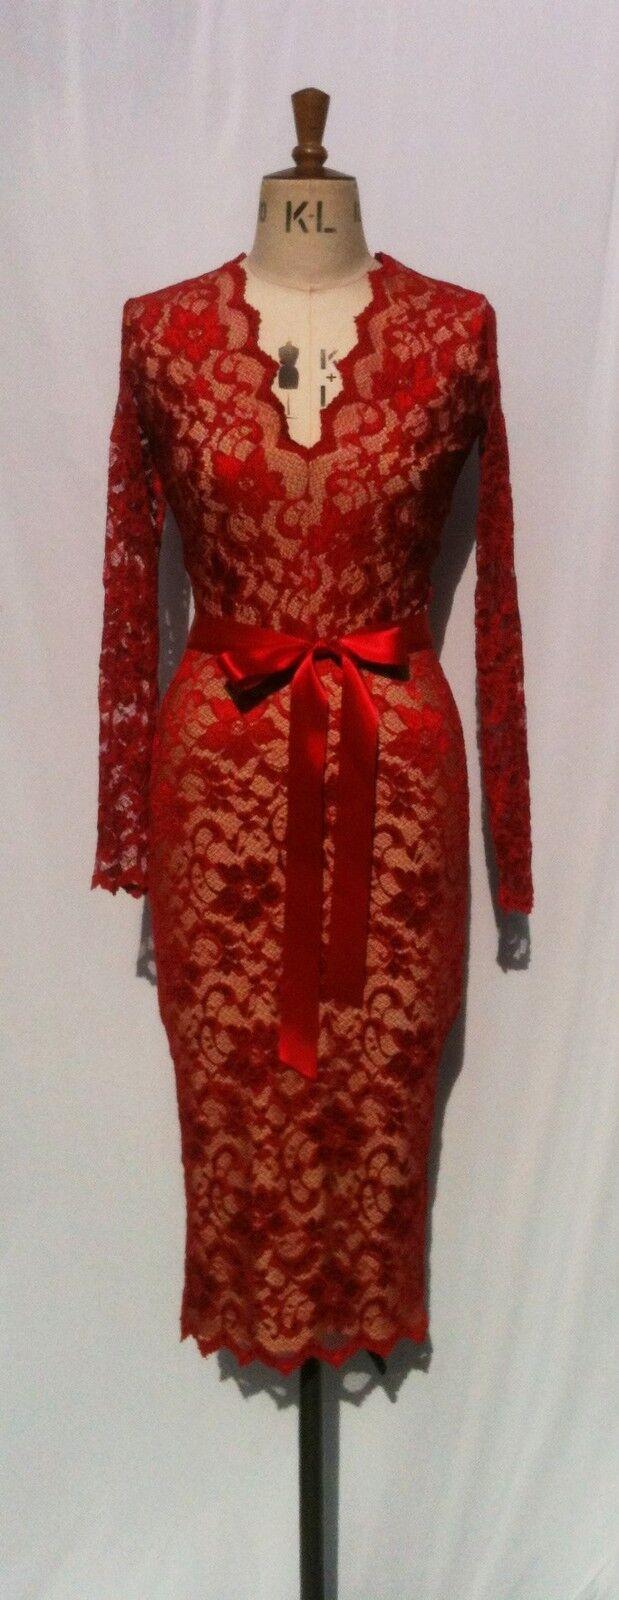 Baylis & Knight Red Nude Low Cut LACE Wiggle Knee Pencil Dress Dita Burlesque